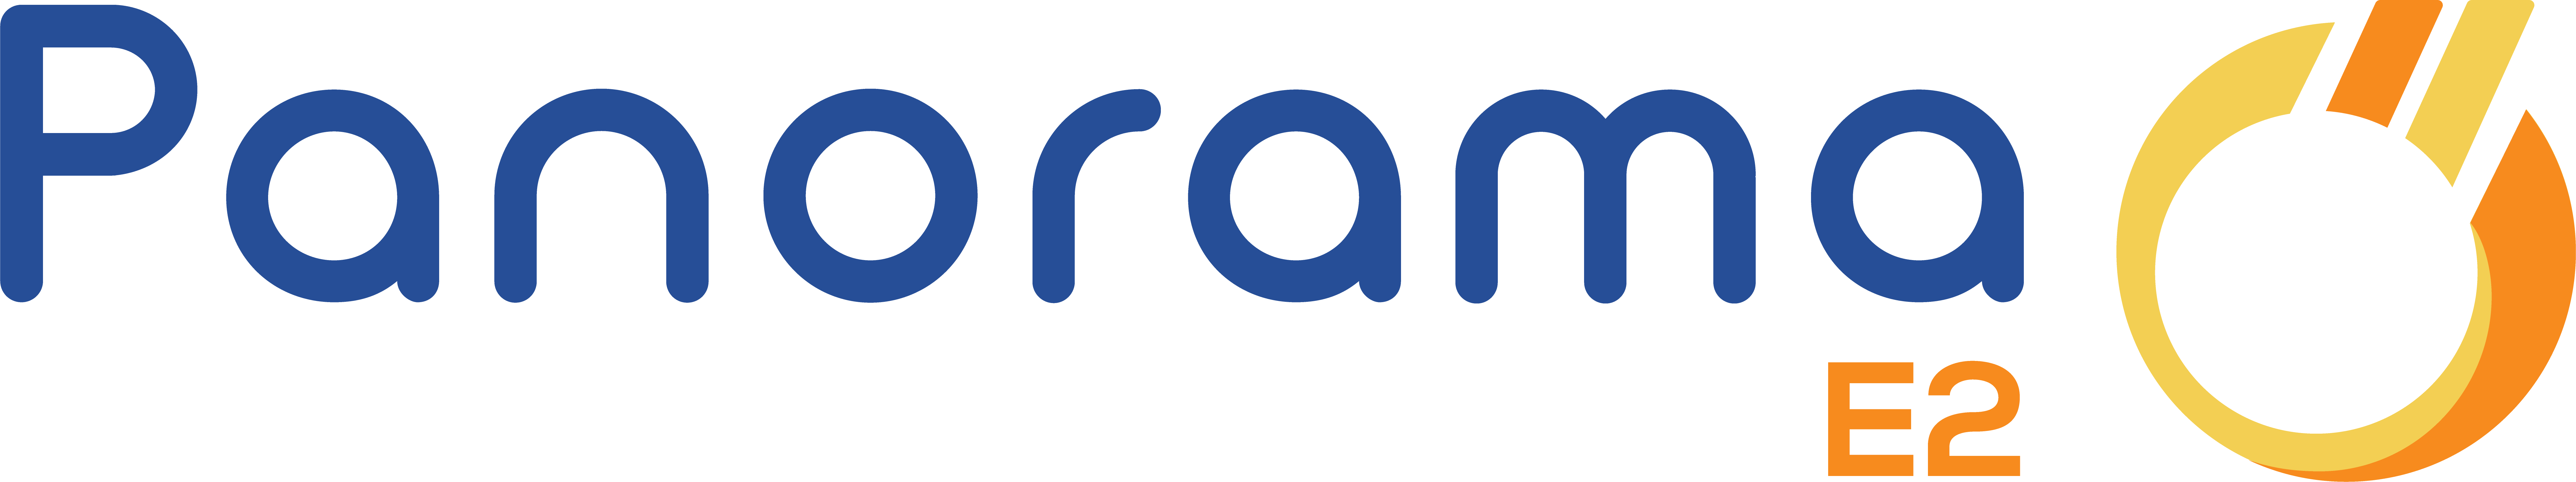 Panorama E2